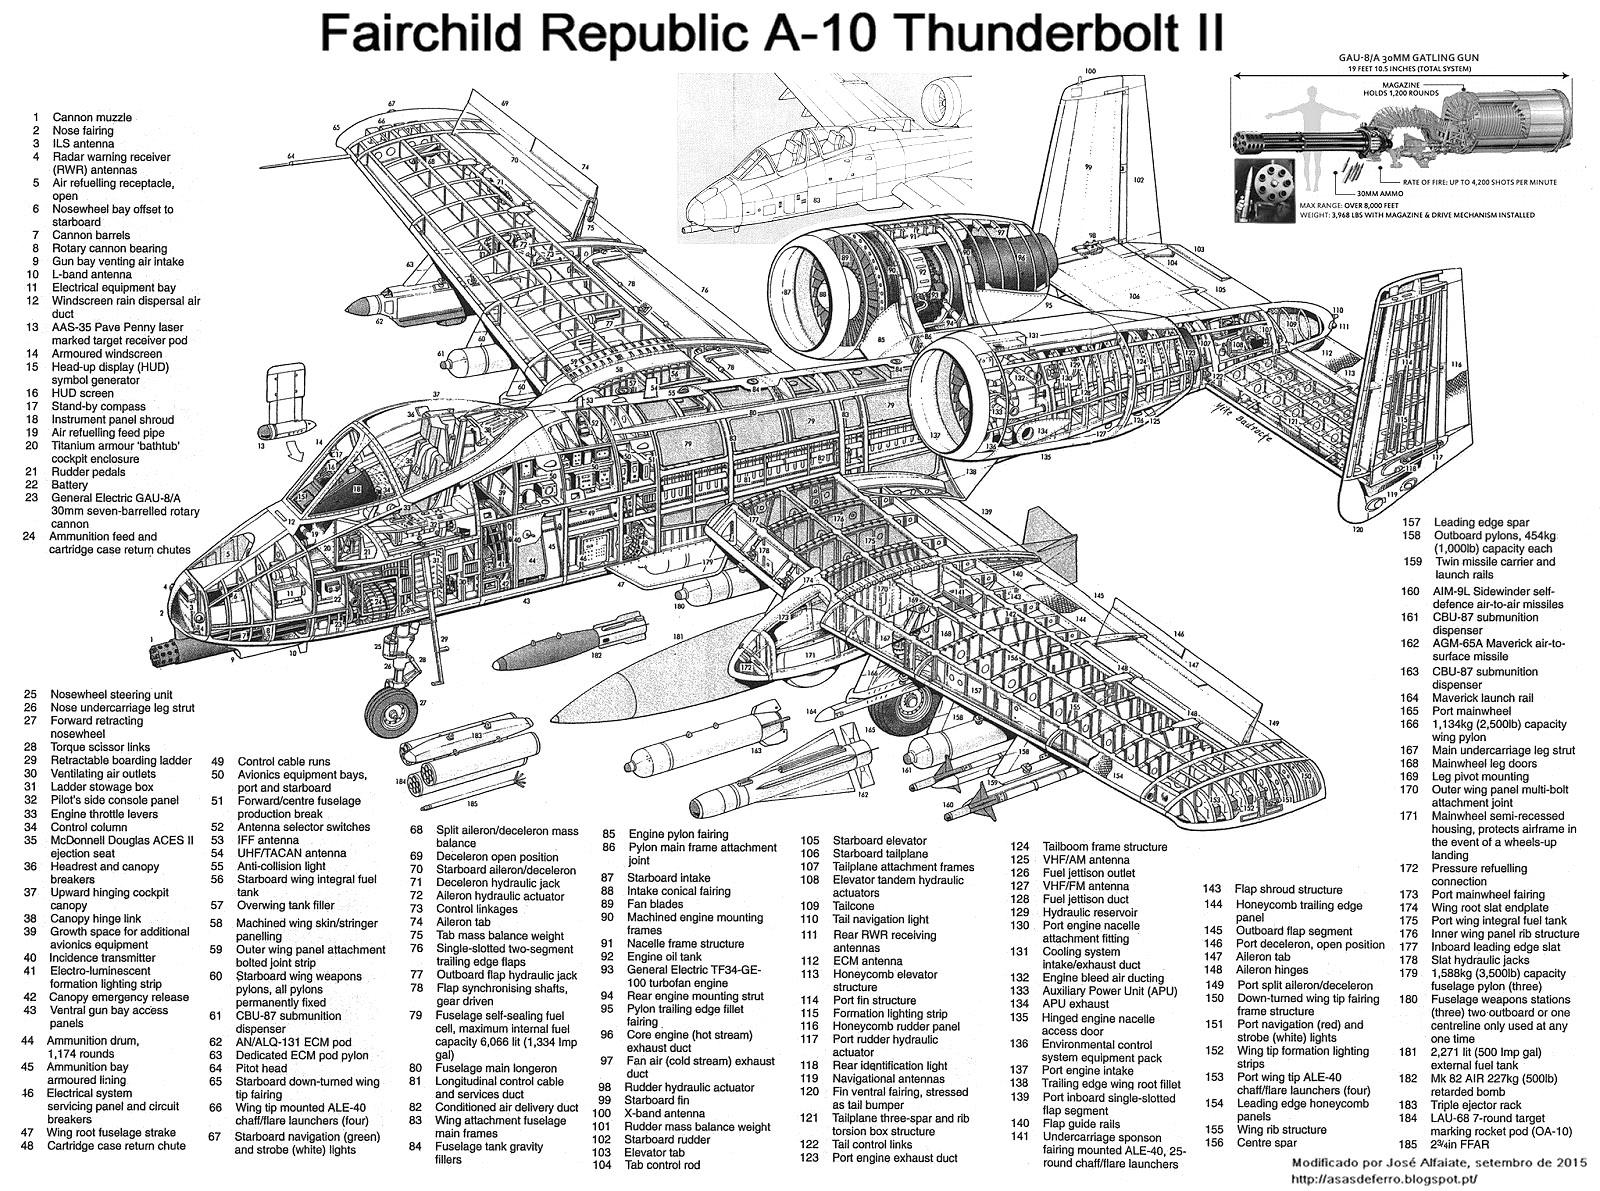 a-10-cut_fairchild_republic_a-10_thunderbolt_ii.jpg